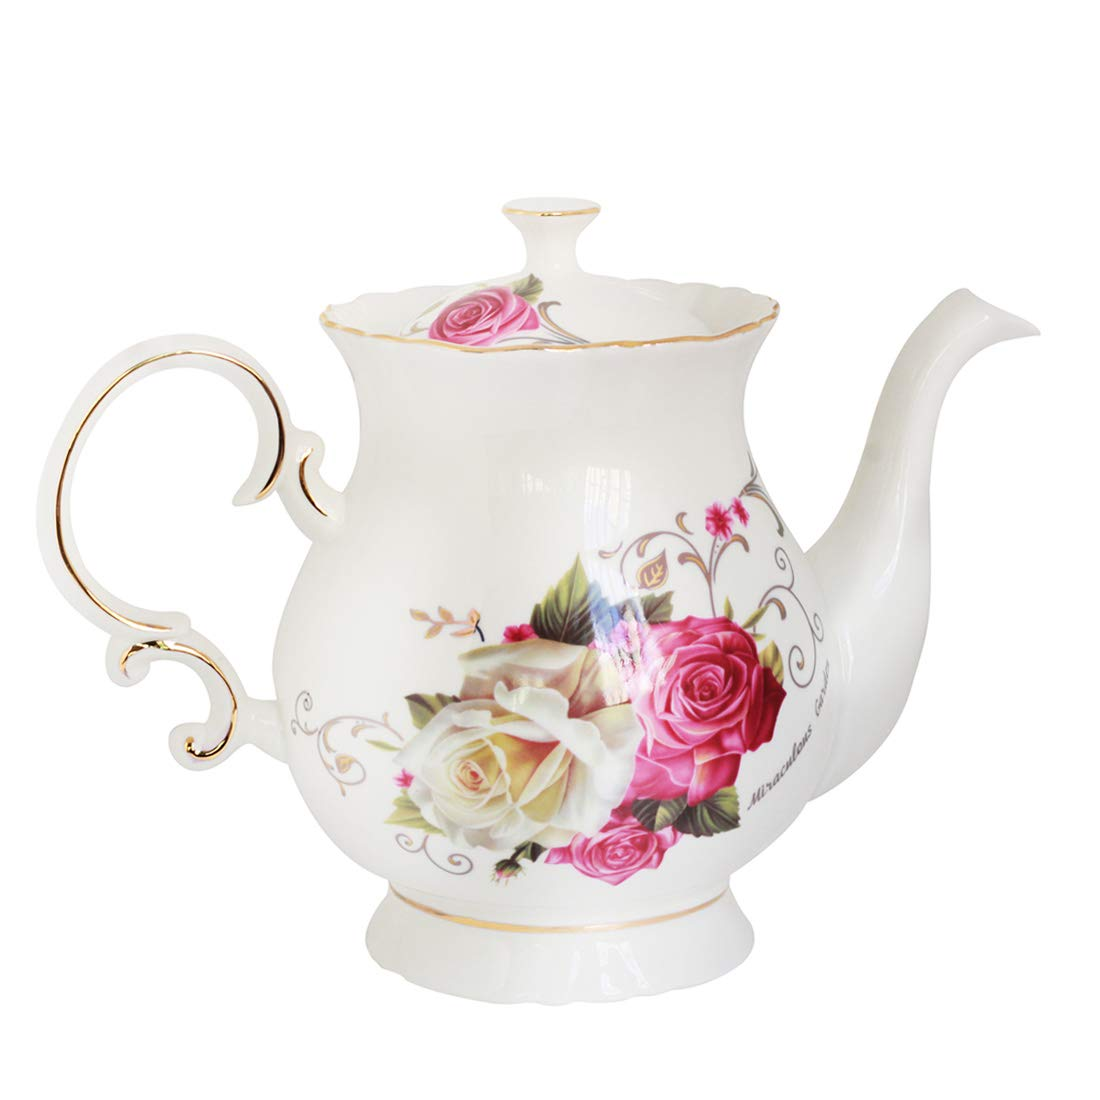 Jomop European Style Ceramic Flower Teapot Coffee Pot Water Pot Porcelain Gift Petal Large 5.5 Cups (1, Rose)